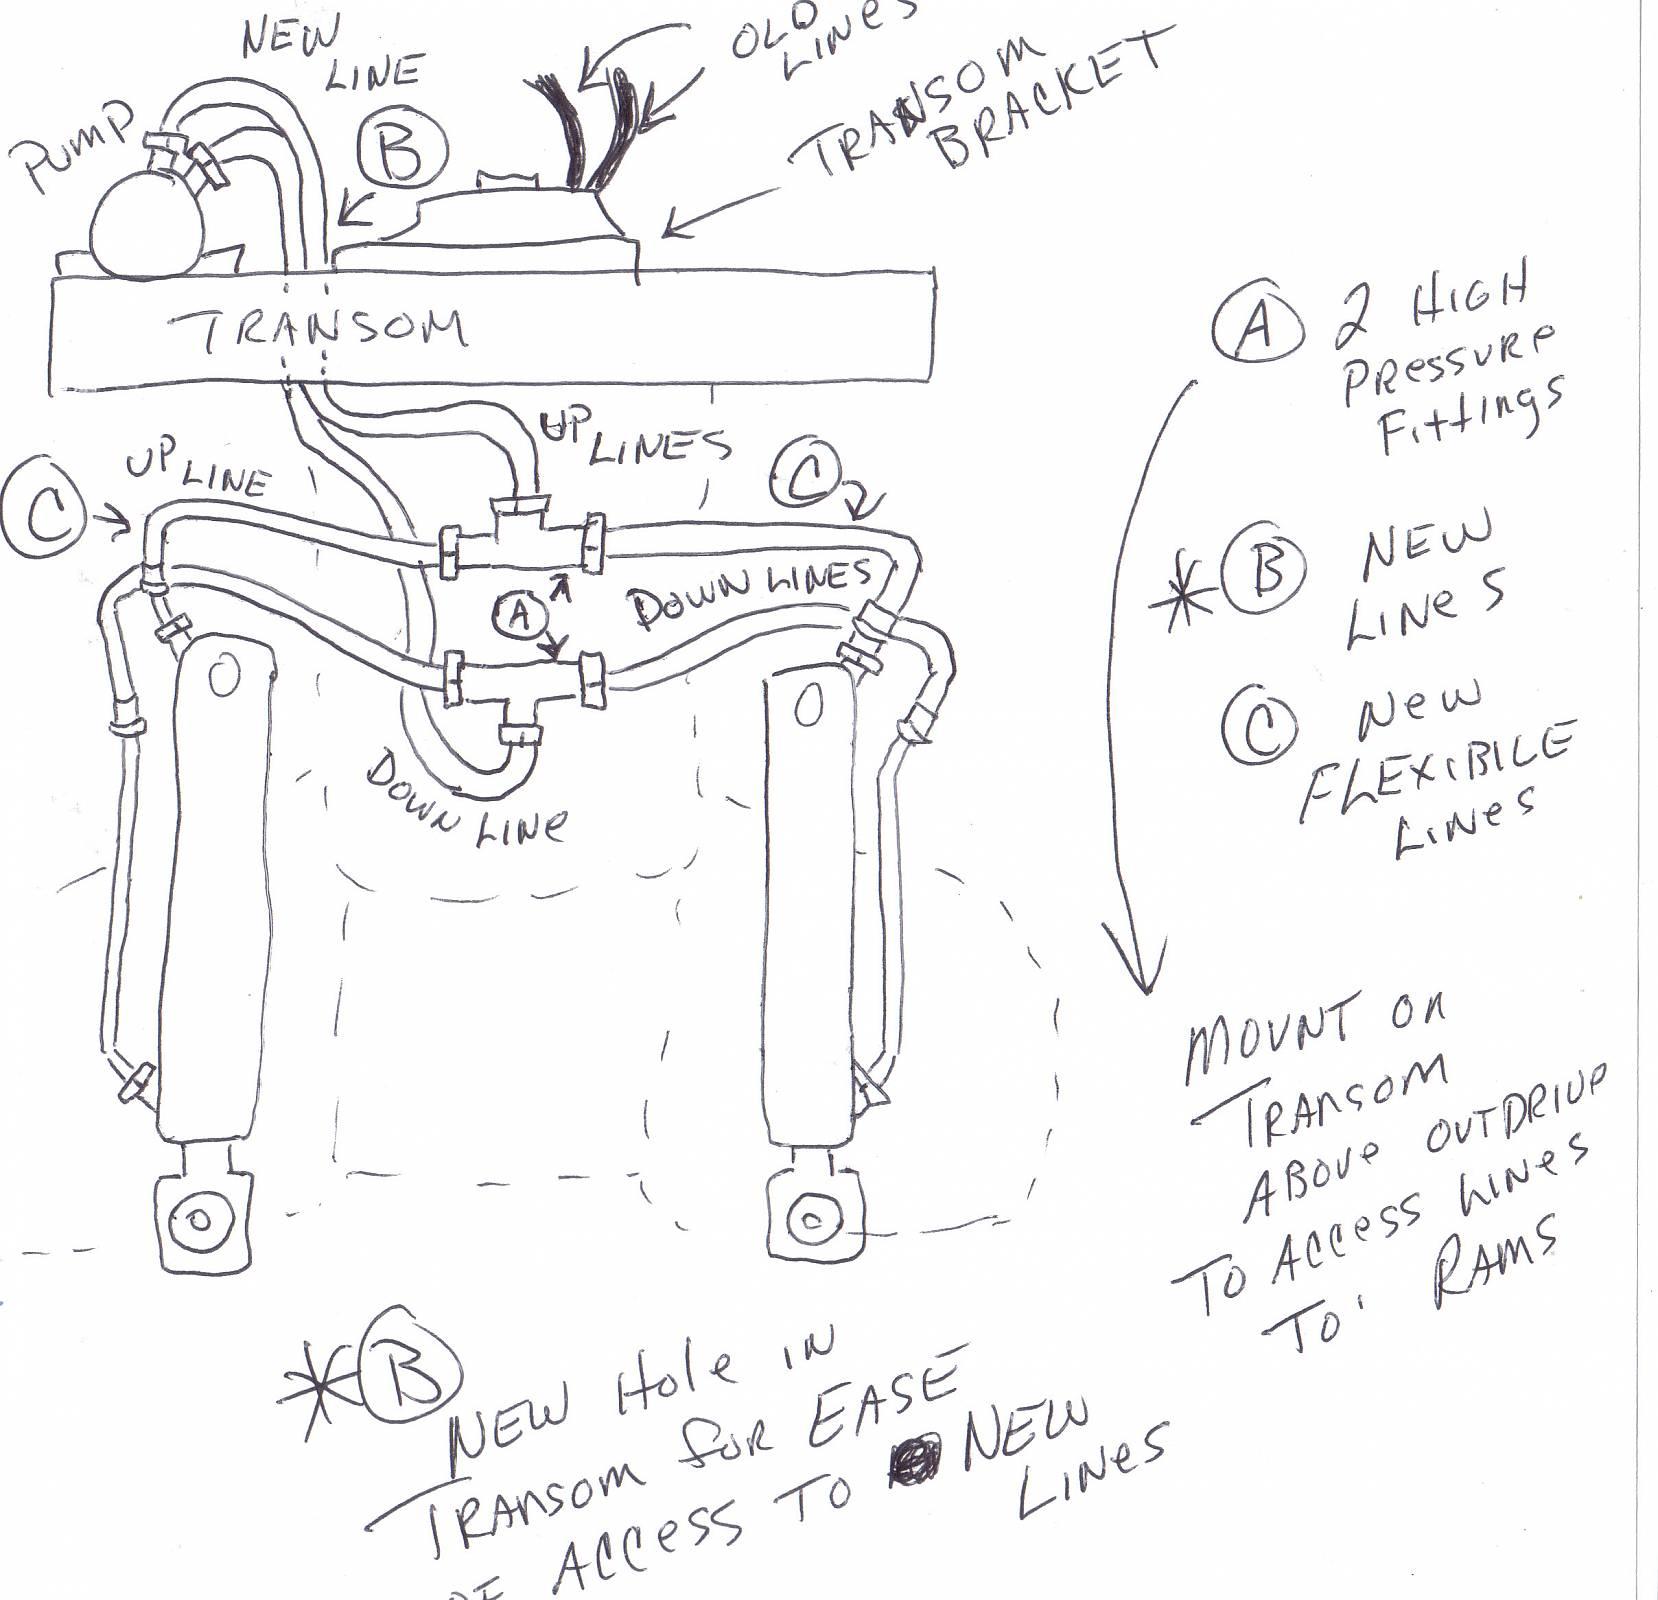 help with tilt trim on omc cobra | Page 2 | Boat Design Net